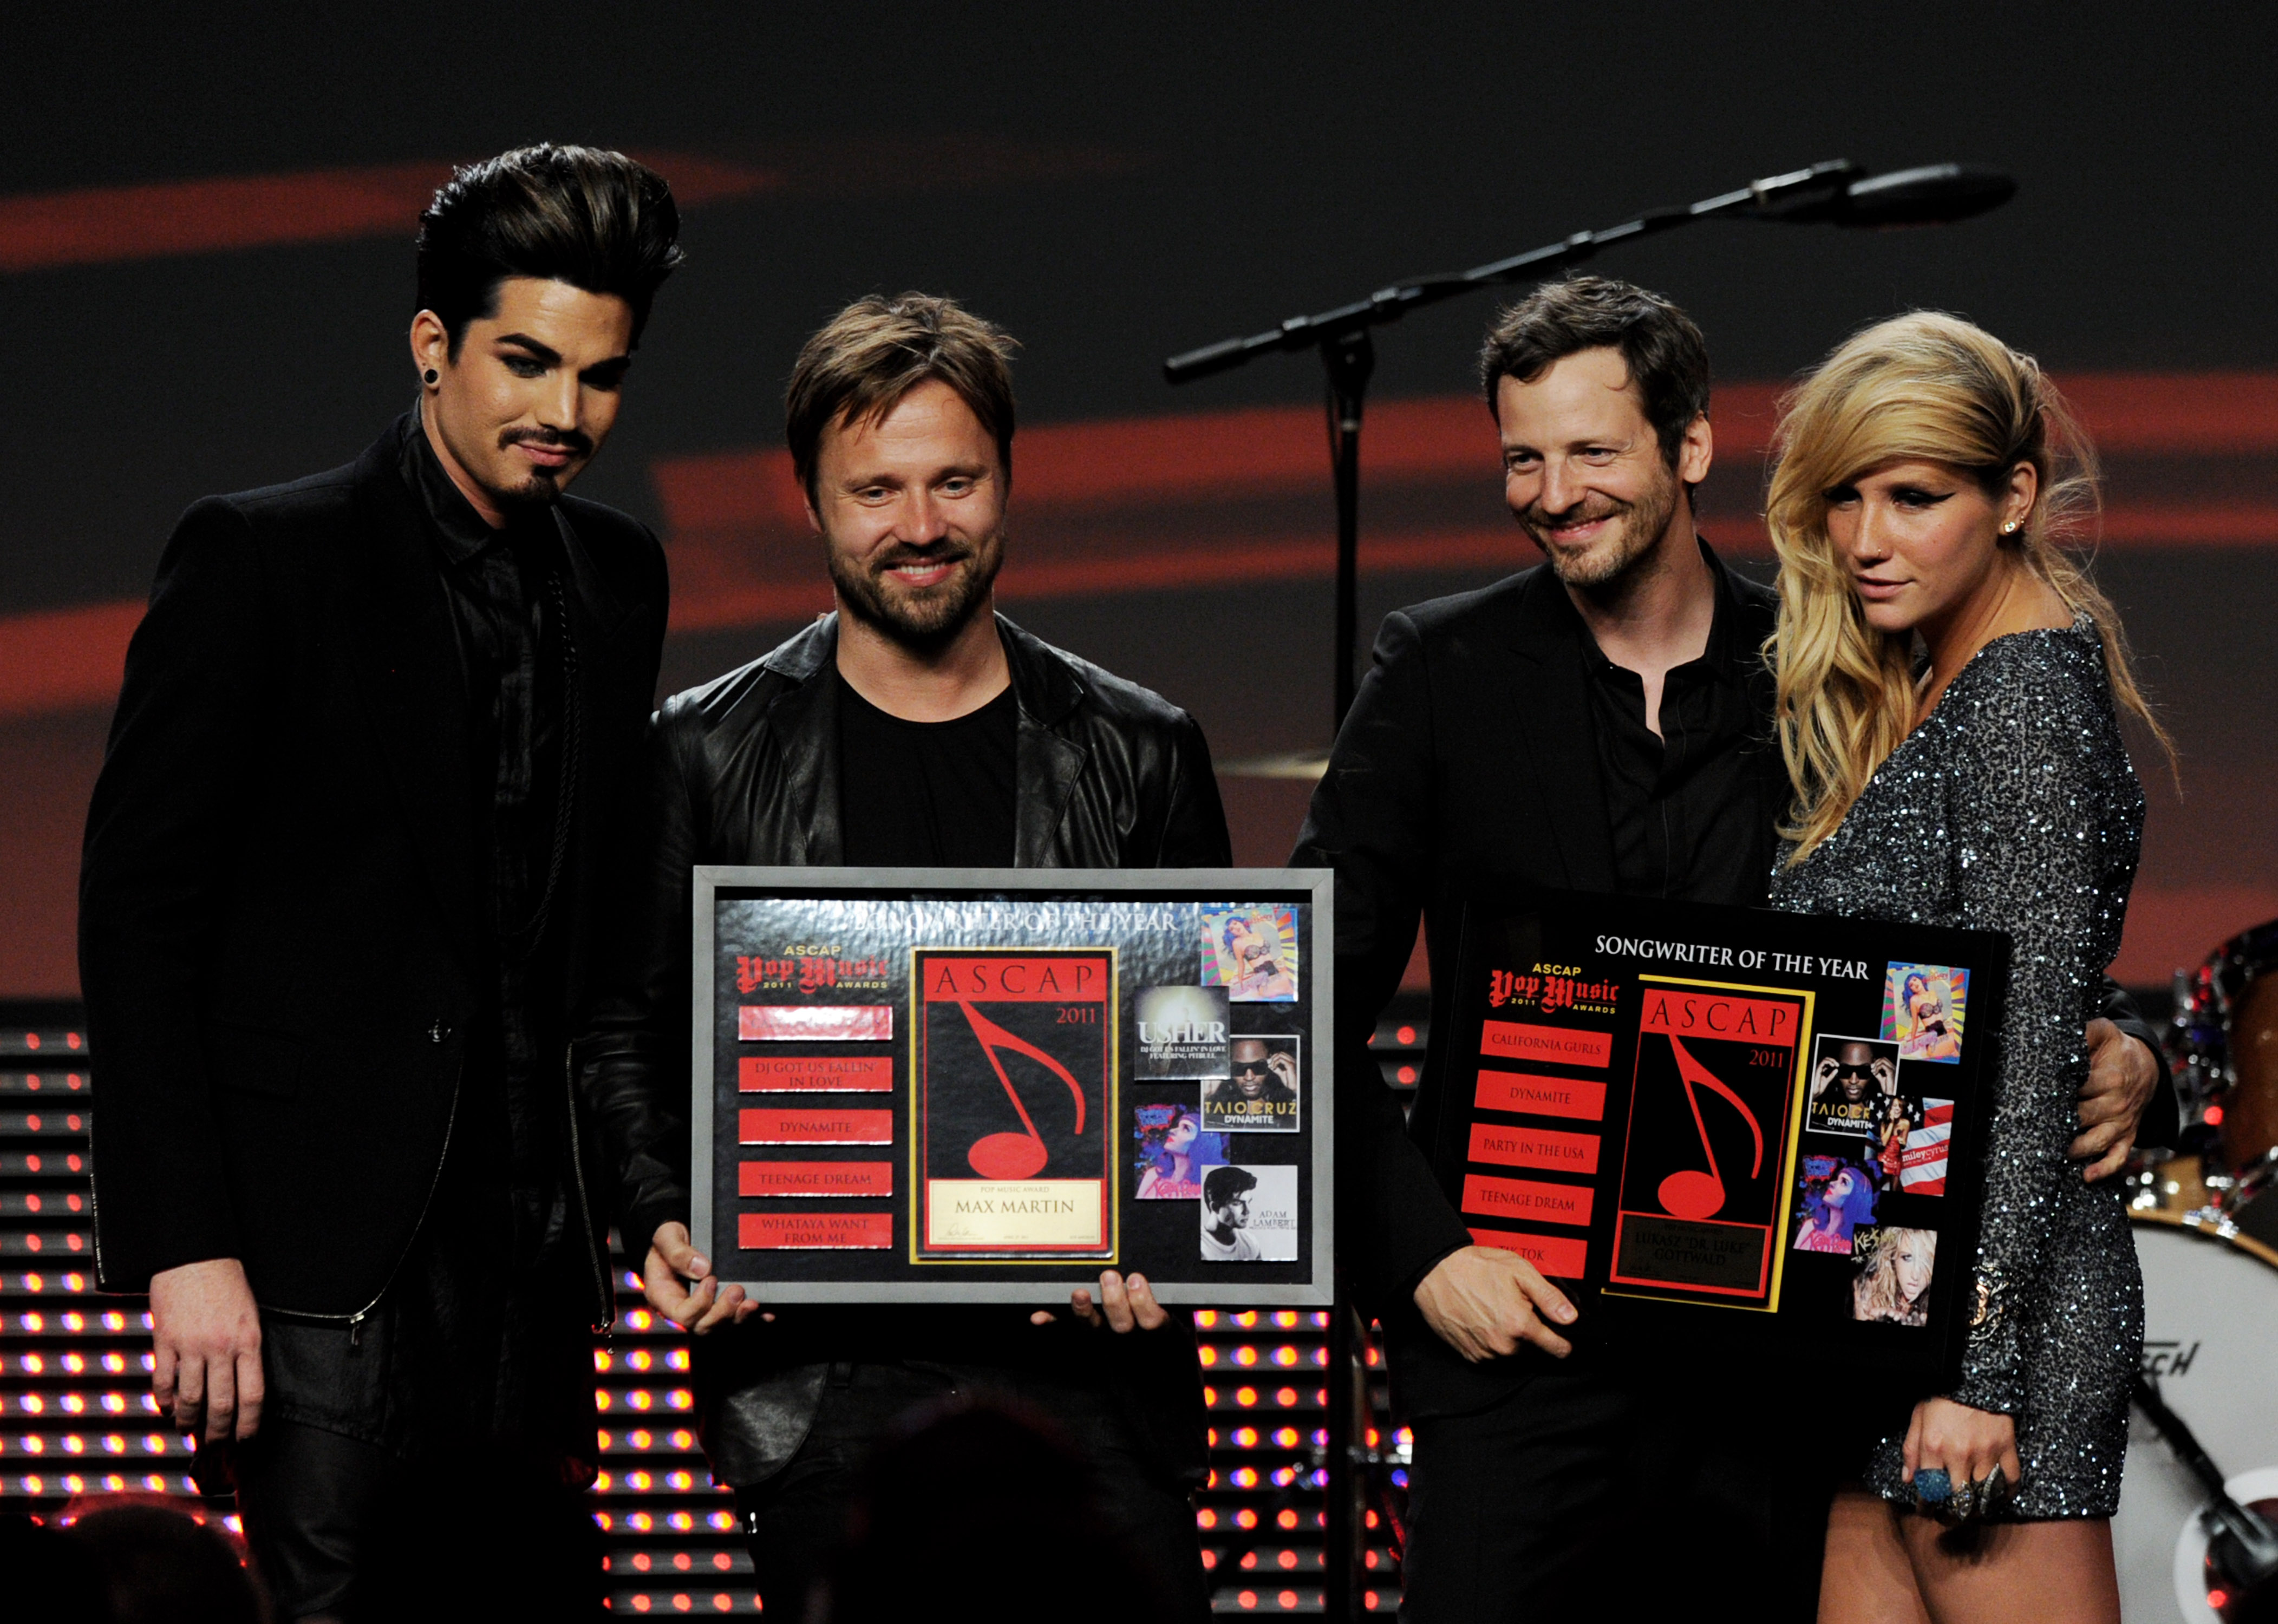 28th Annual ASCAP Pop Music Awards - Show